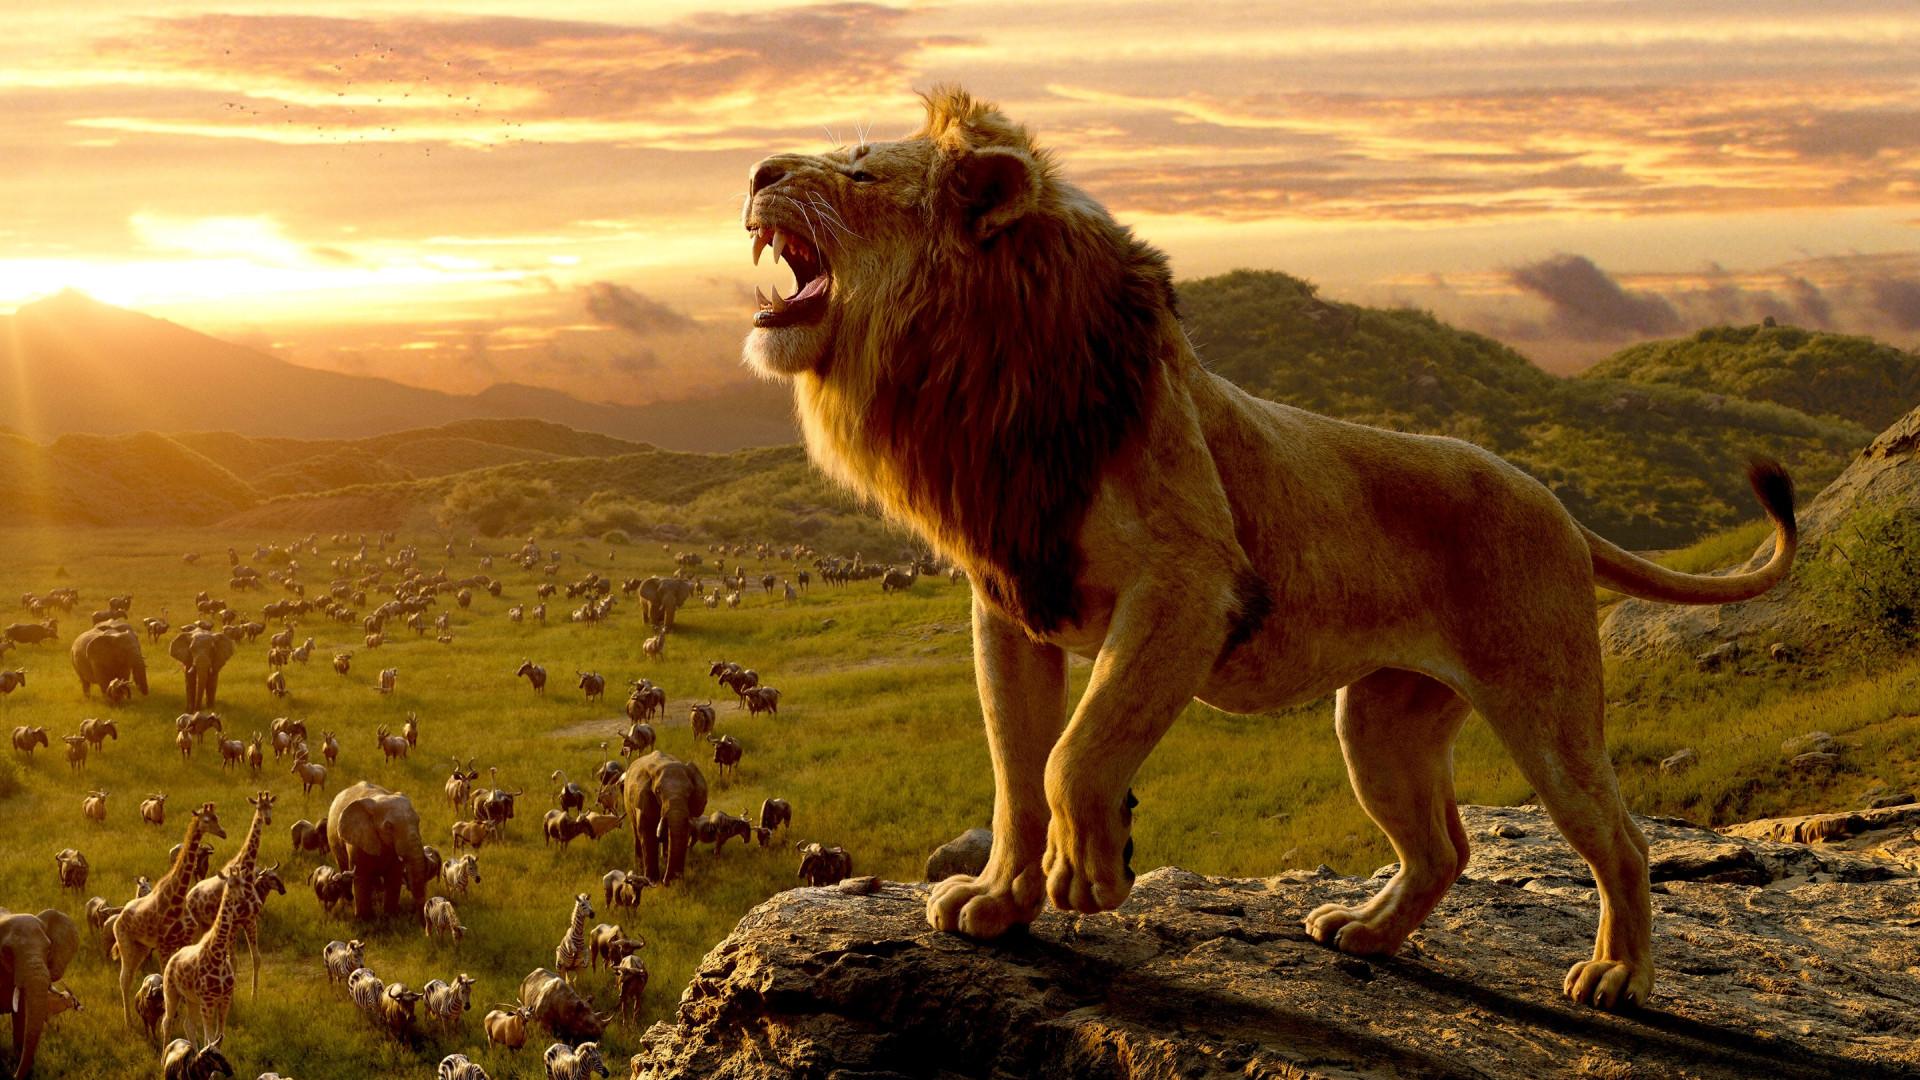 Download wallpaper: Simba, the lion king 1920x1080